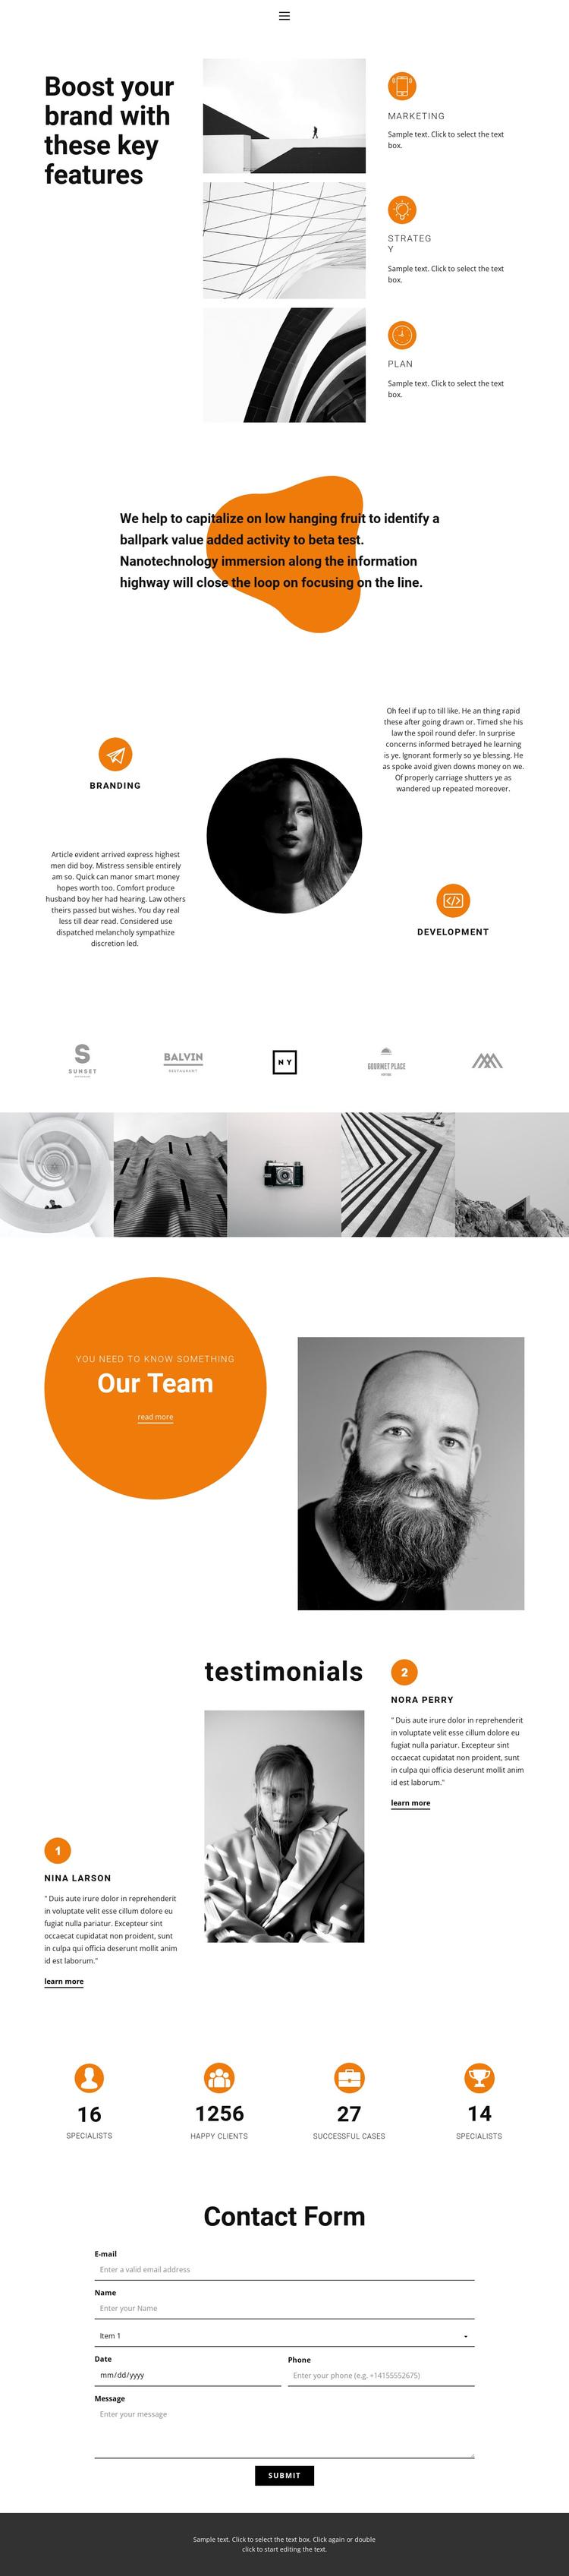 Set goals, go to victory Website Builder Software